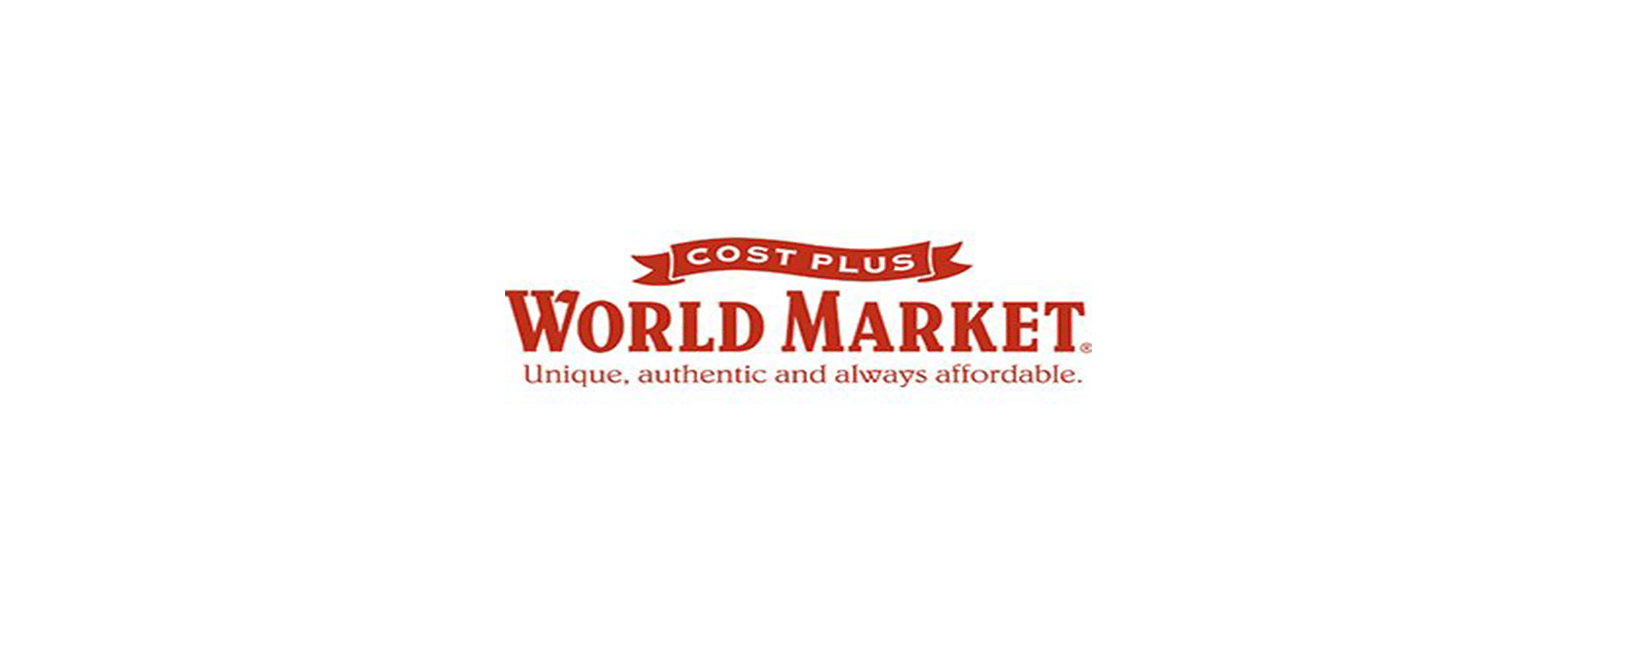 Cost Plus World Market Discount Code 2021